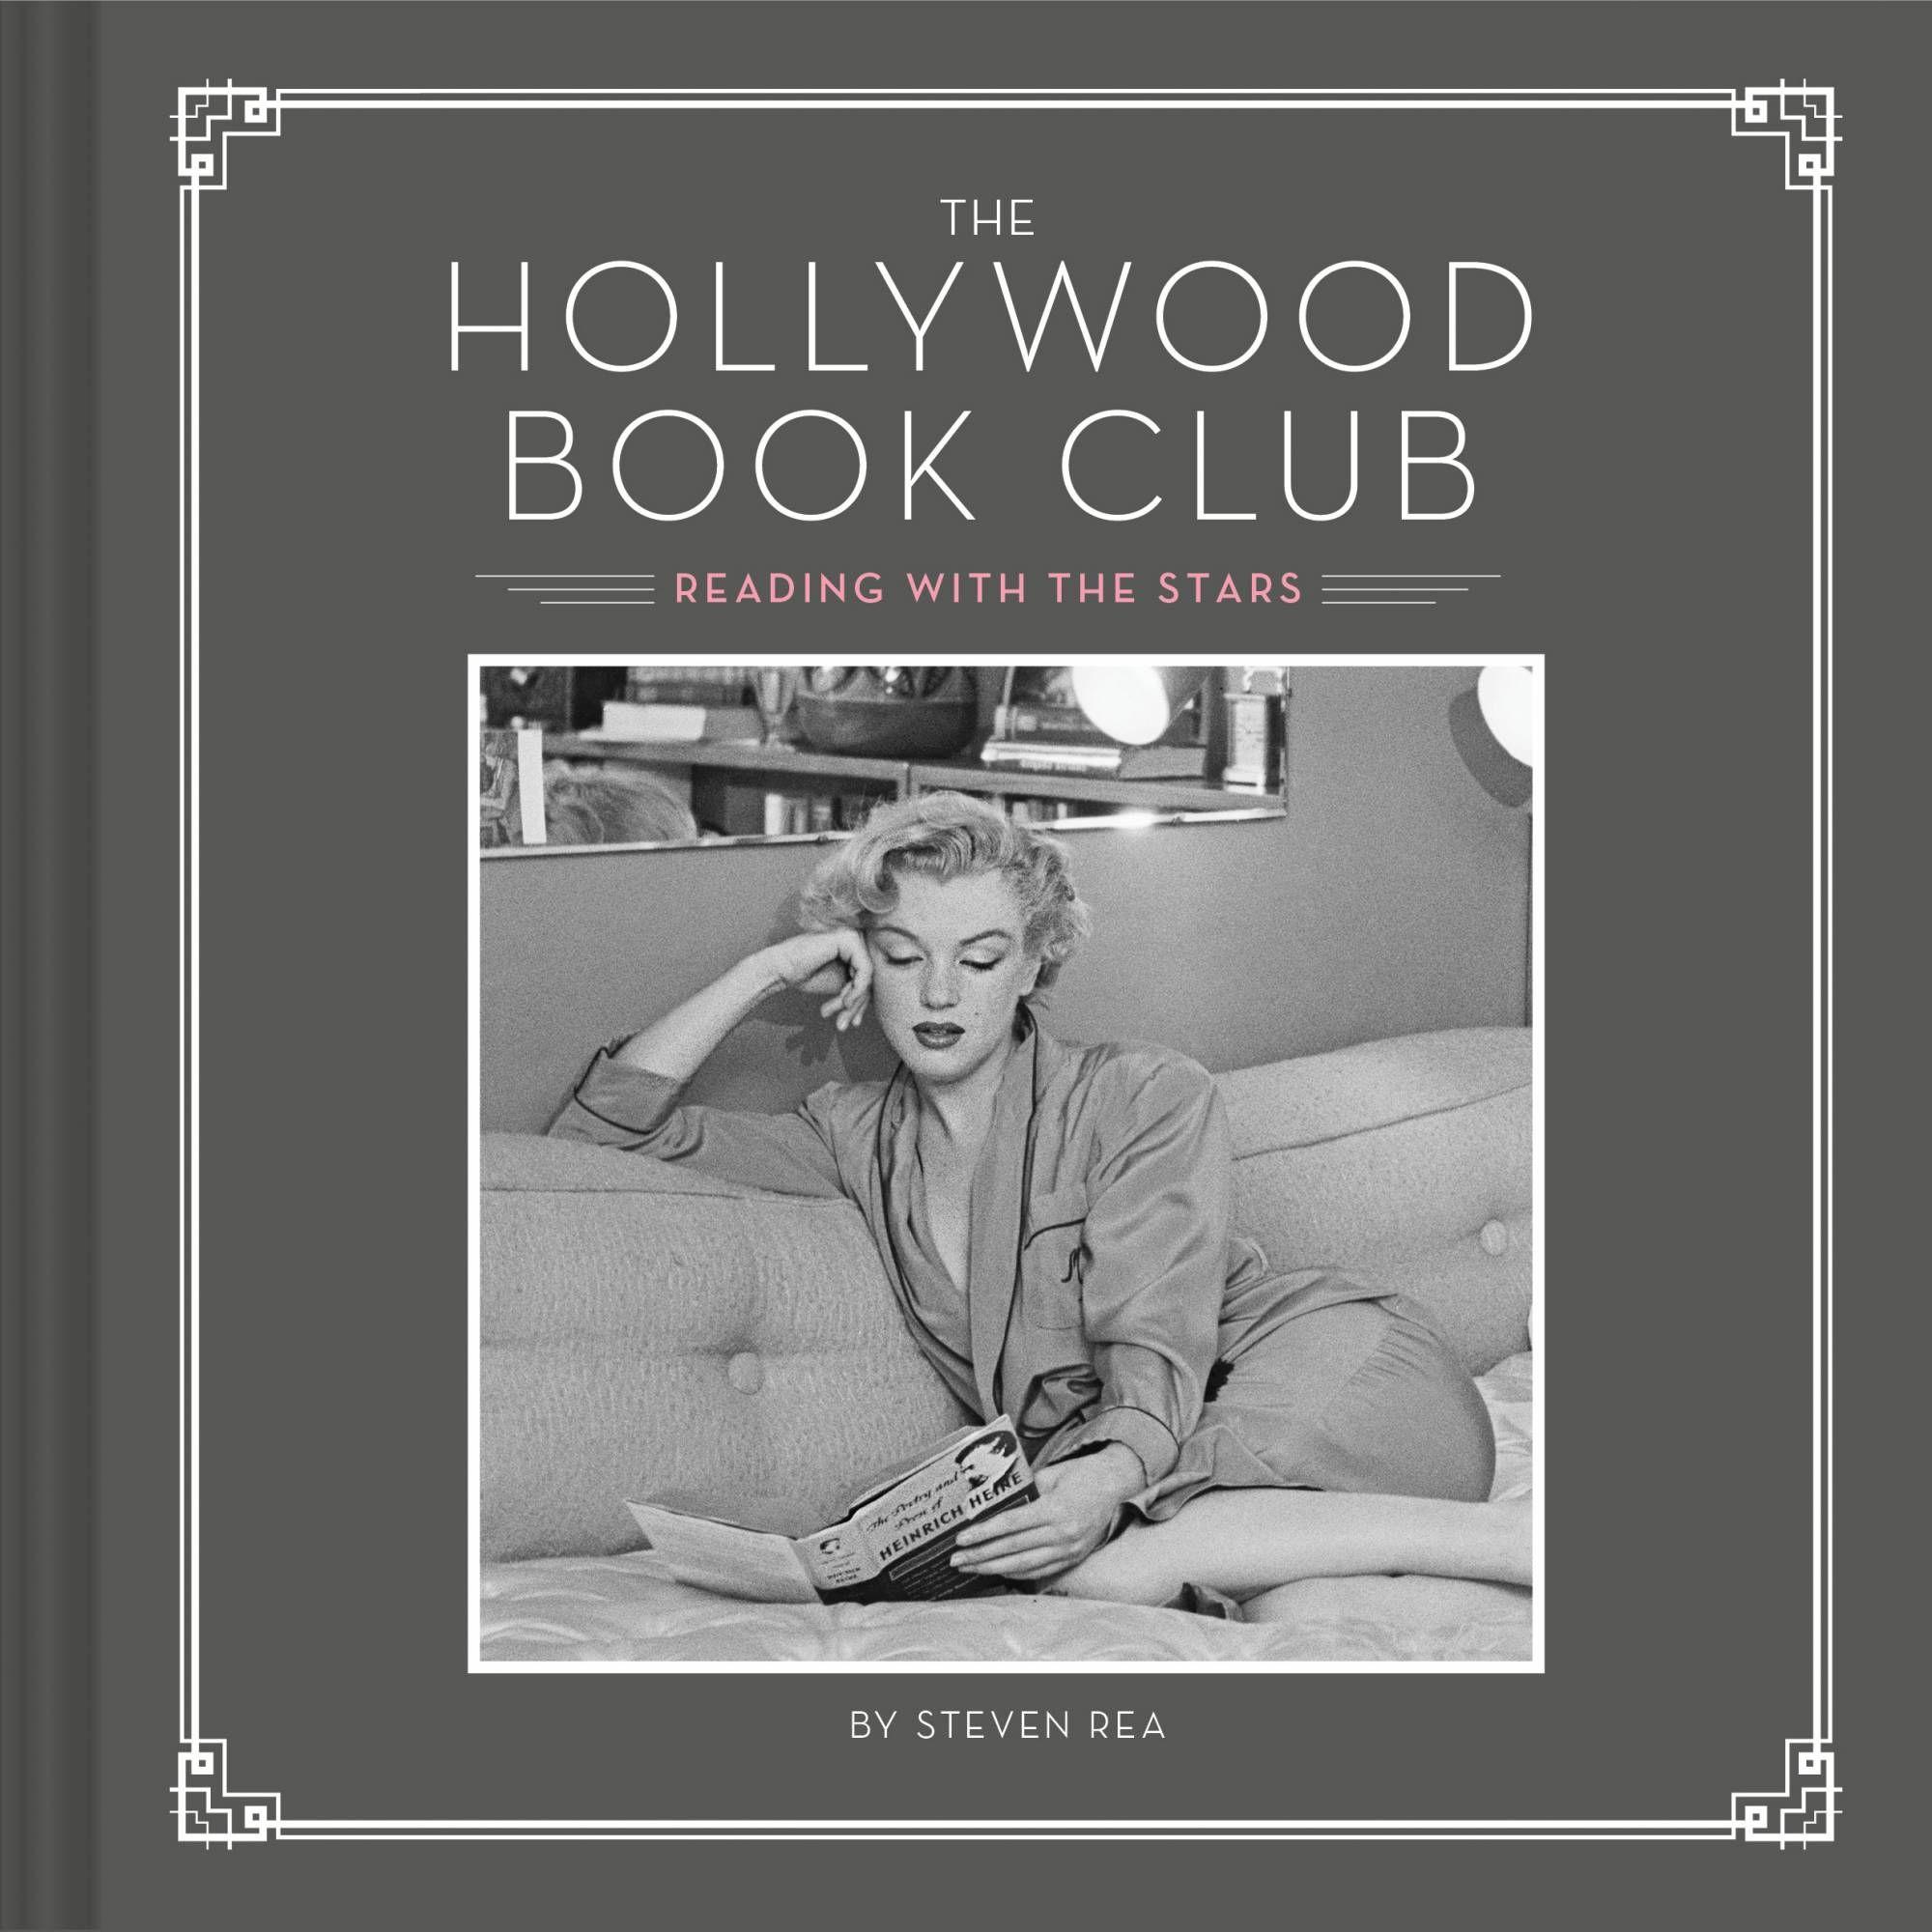 Pin de Estel HC en Marilyn, Immortal Beloved I | Libros